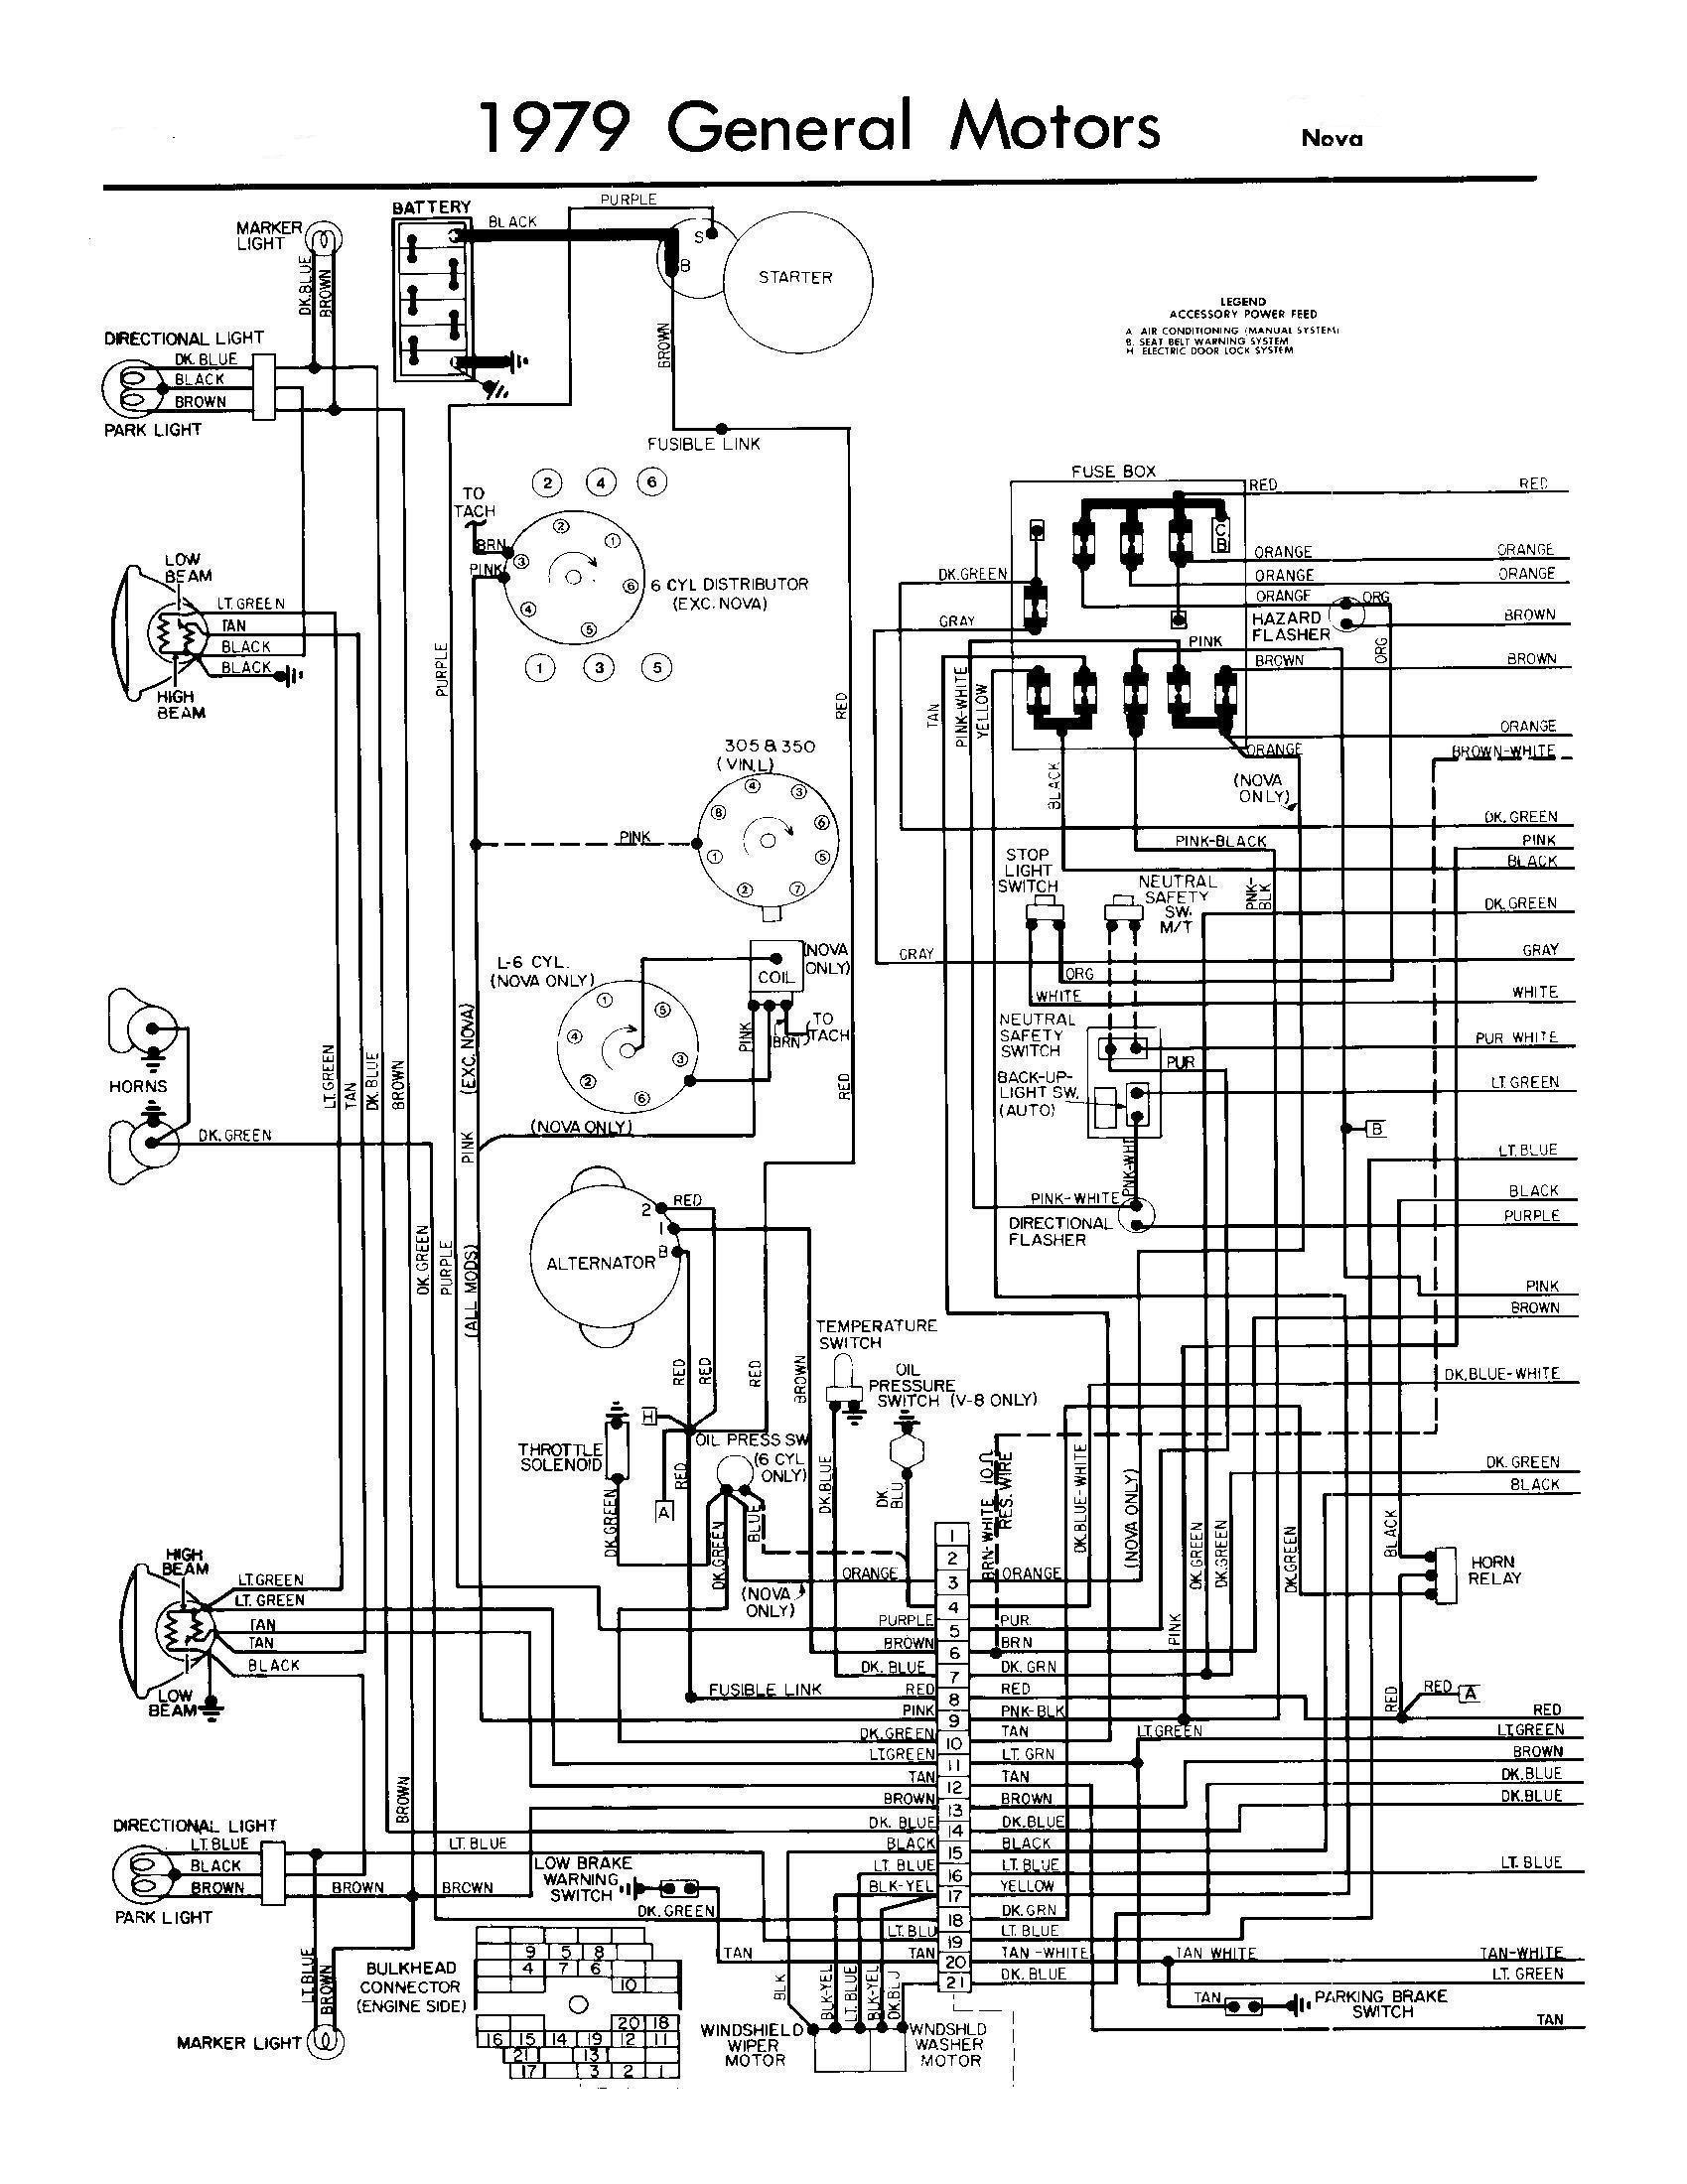 Truck Steering System Diagram All Generation Wiring Schematics Chevy Nova forum Of Truck Steering System Diagram